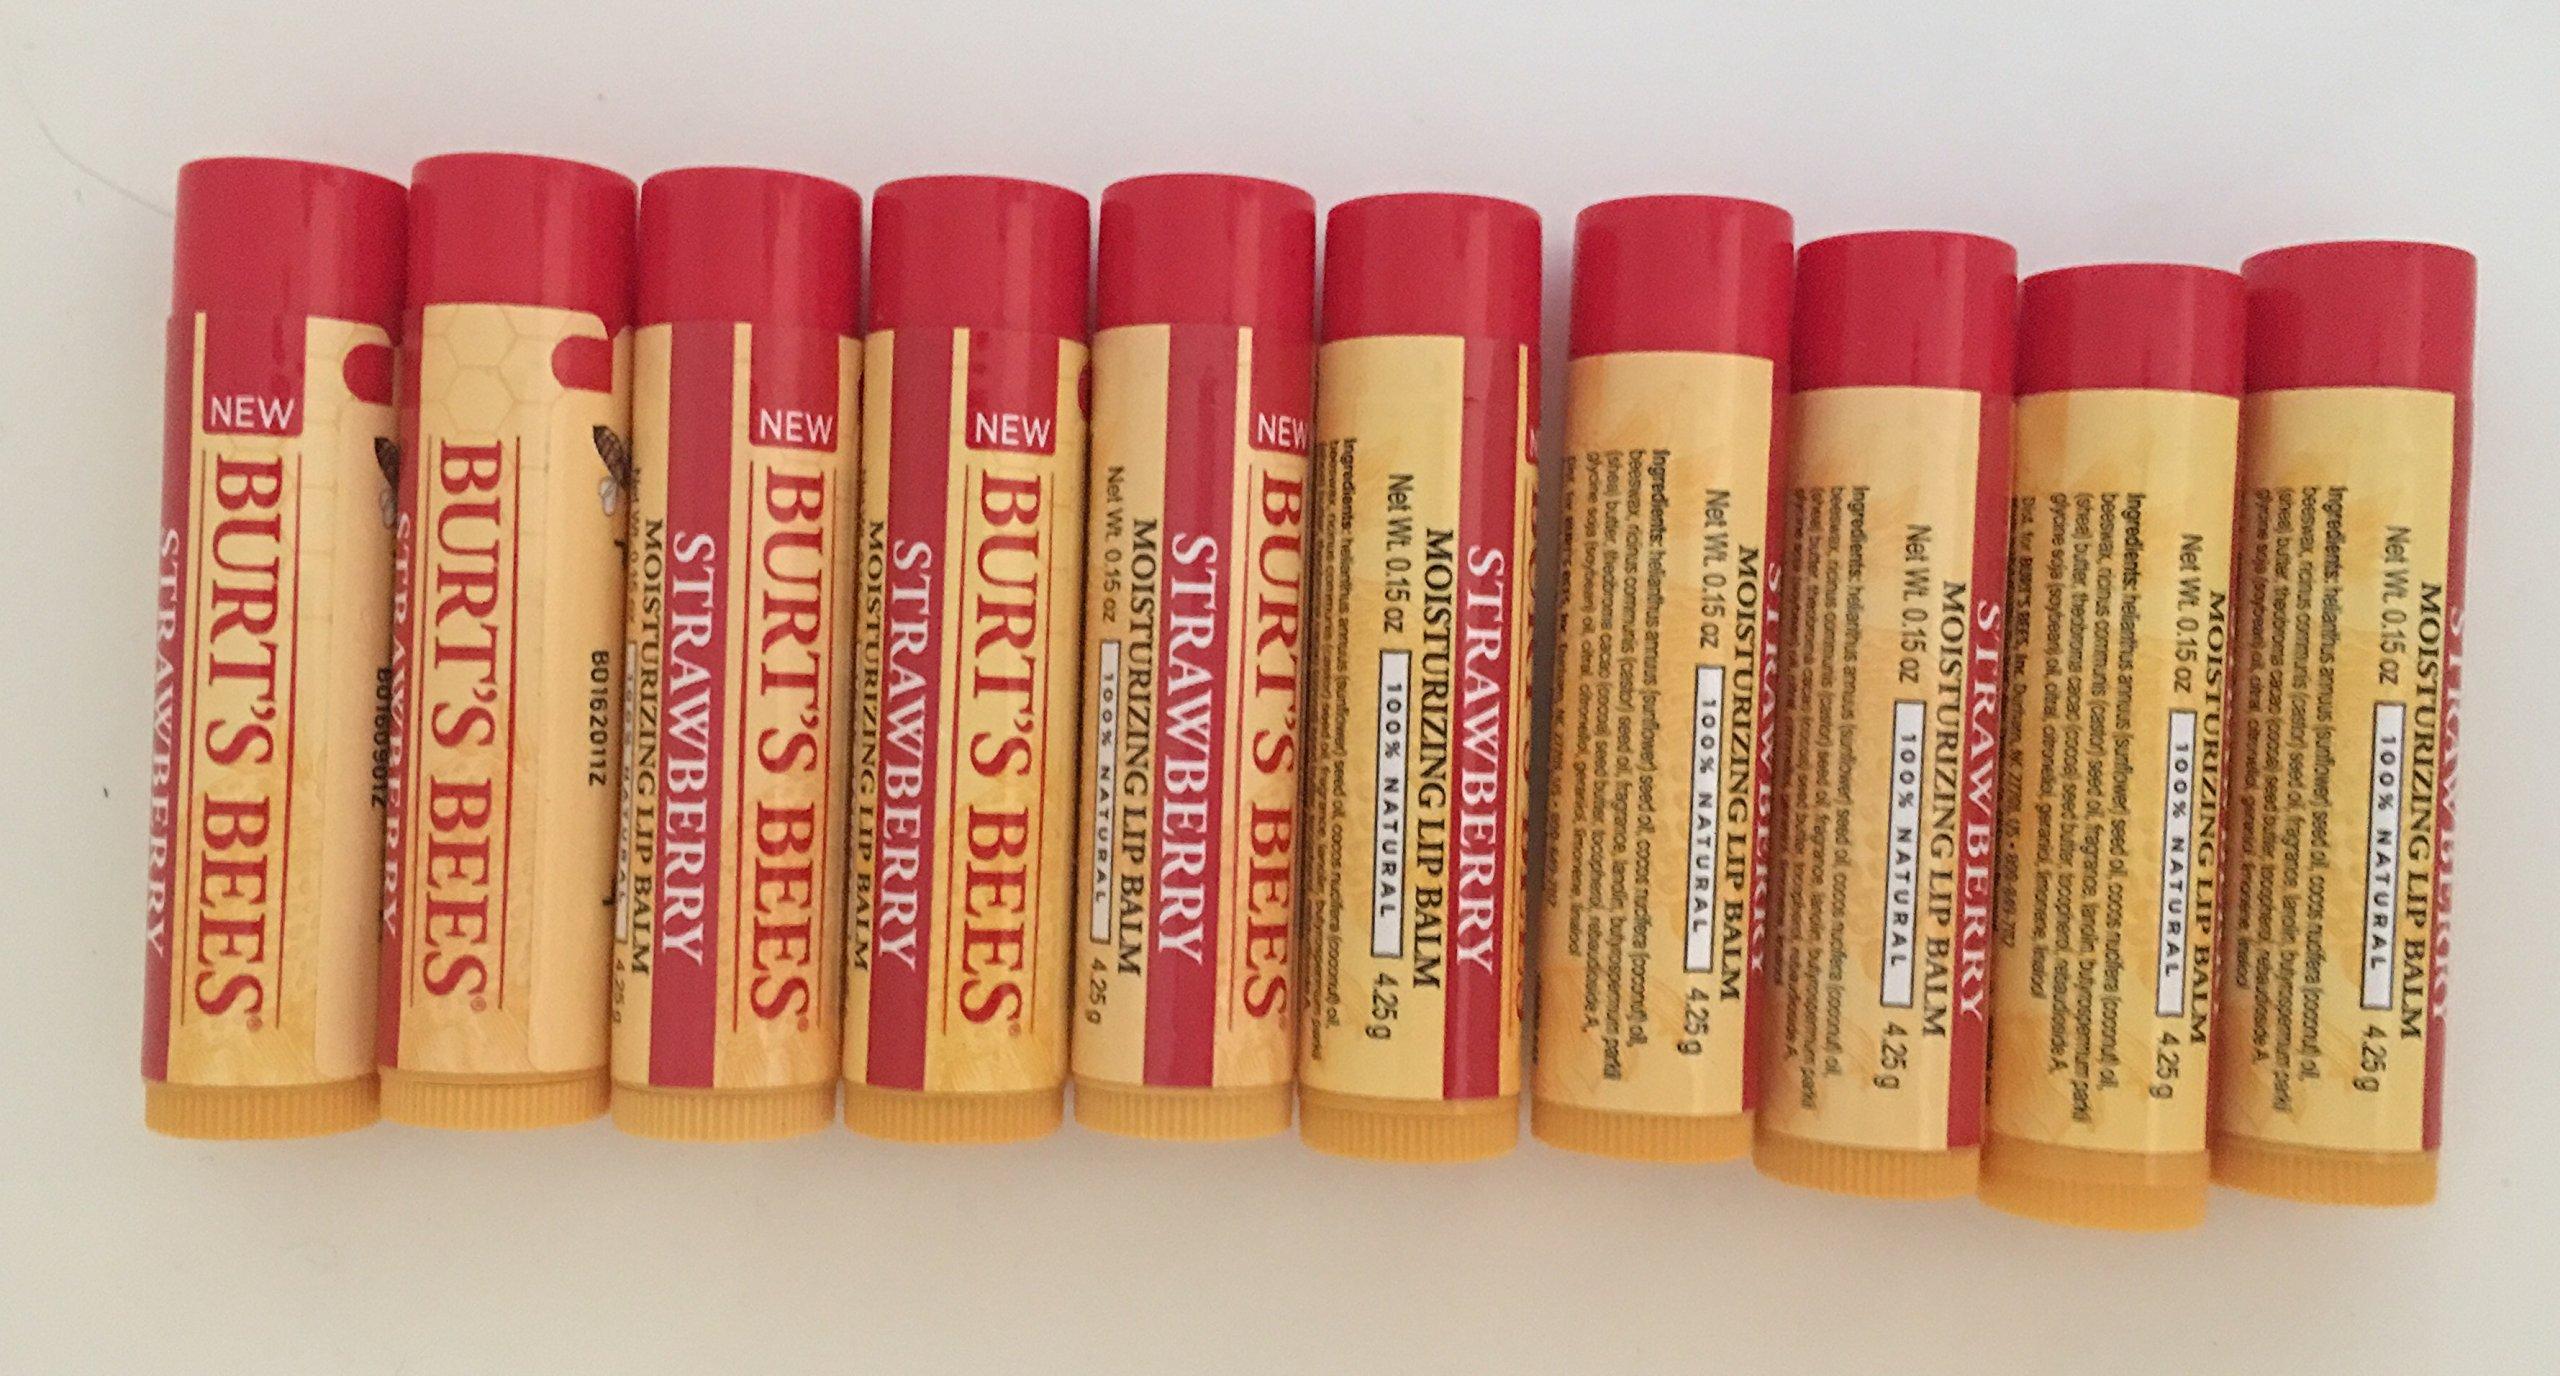 0.15 oz Burts Bees Strawberry Lip Balms (Pack of 10)